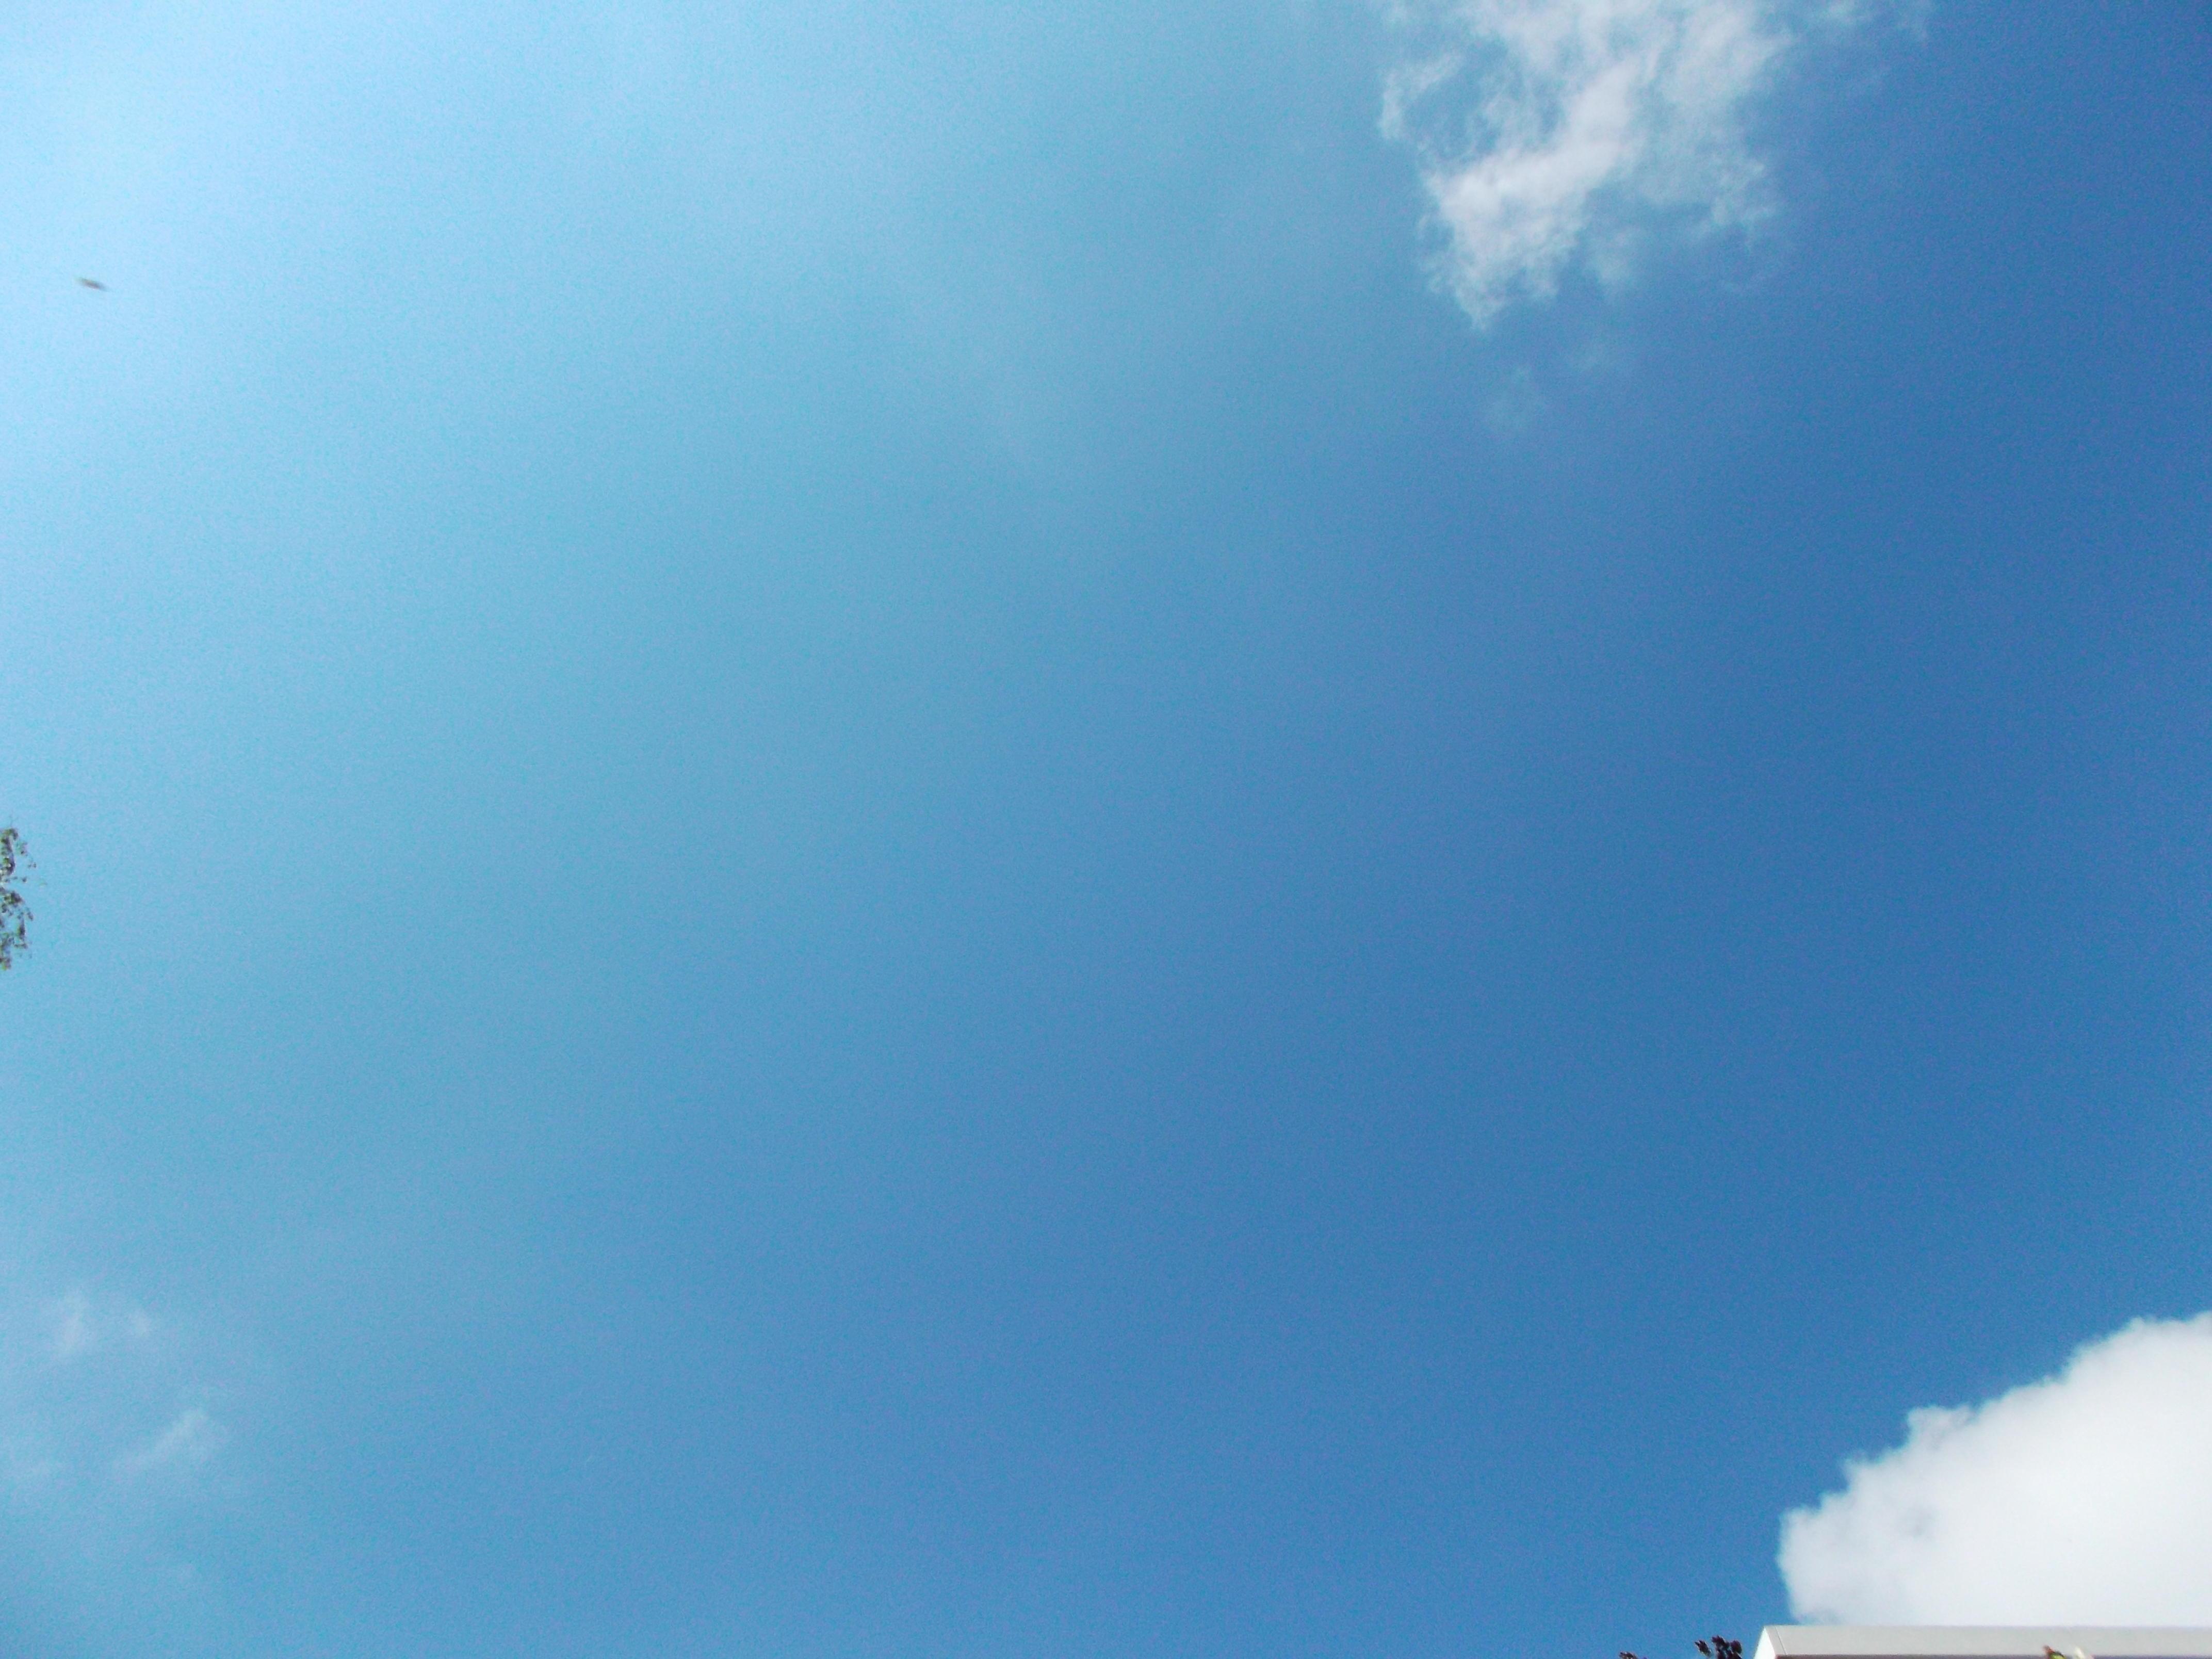 2013-06-02 Longitude -0.371 Latitude 49.182 Altitude 29 Heure 11h22